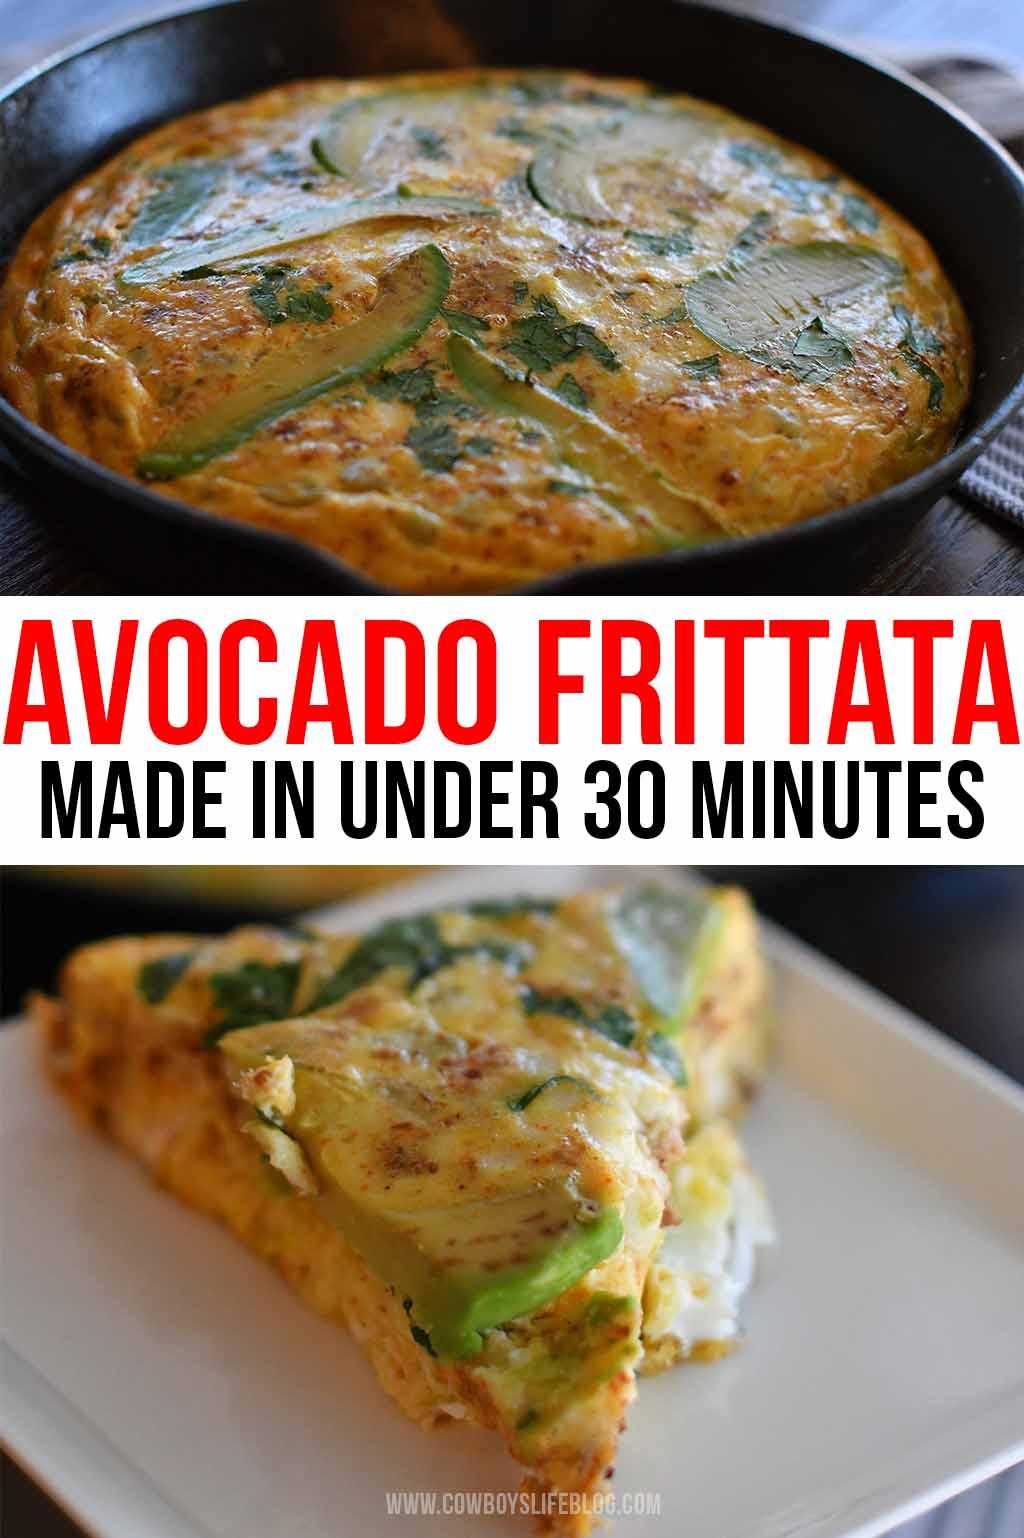 How to make an Avocado Frittata